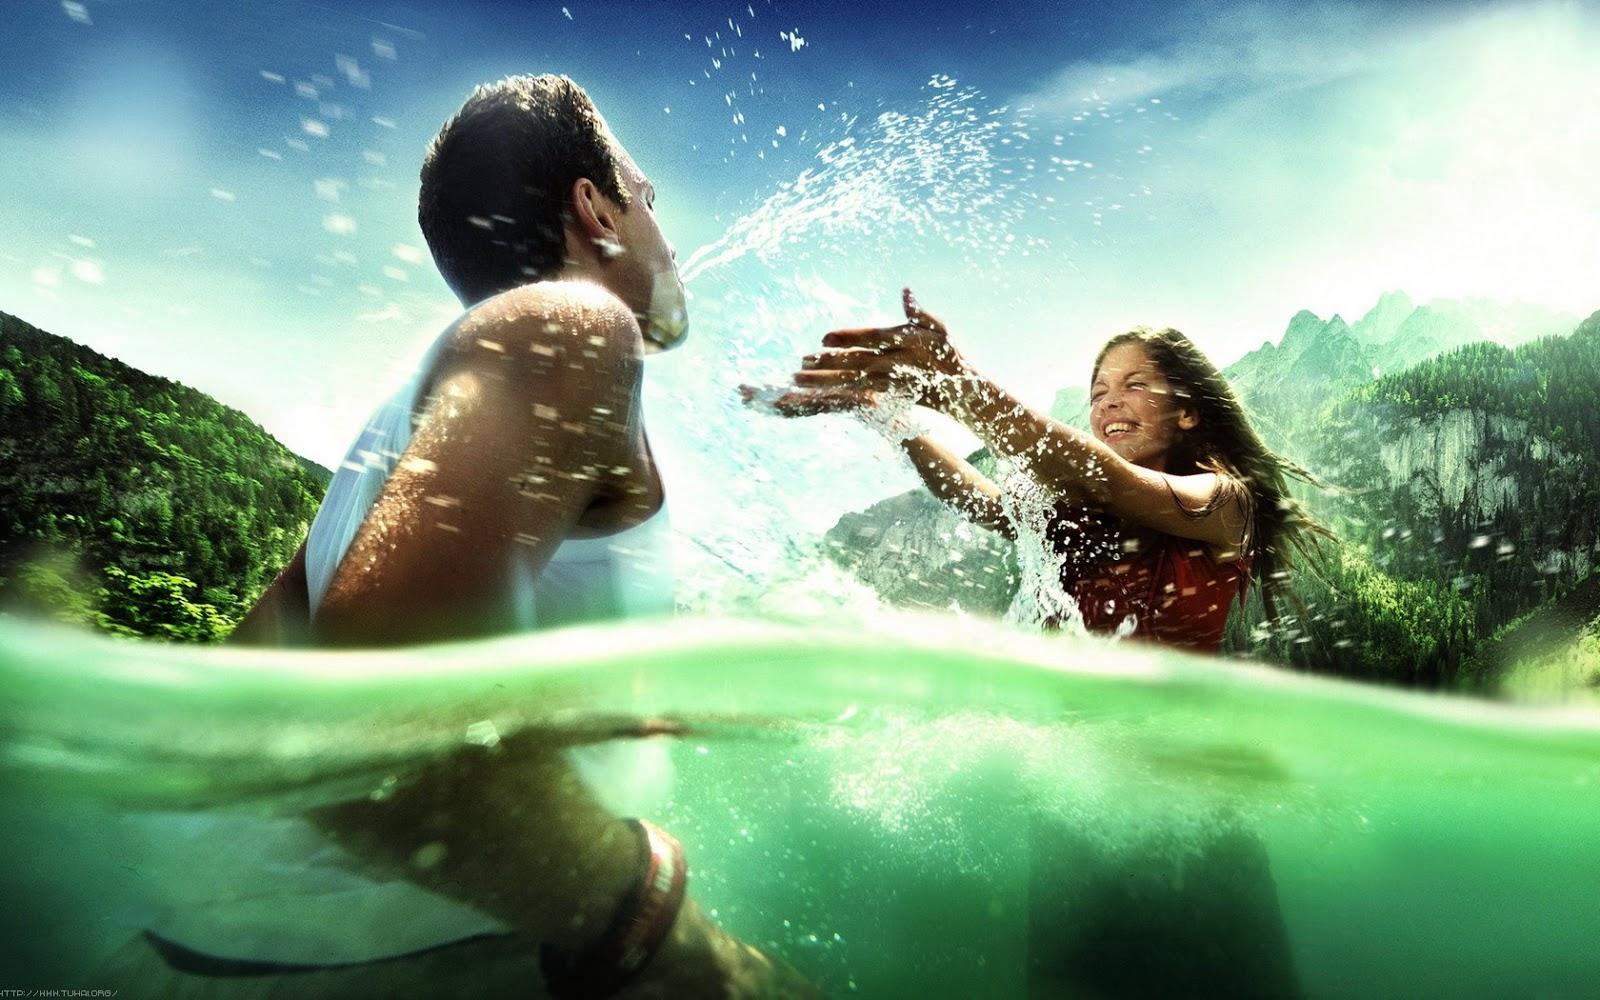 http://1.bp.blogspot.com/-RCxBcFehHaE/UQopx8IA0hI/AAAAAAAAI7E/ddKyZfIeKHk/s1600/Loving+Couple+Playing+With+Water+HD+Wallpaper-1680x1050-bestlovehdwallpapers.blogspot.com.jpg